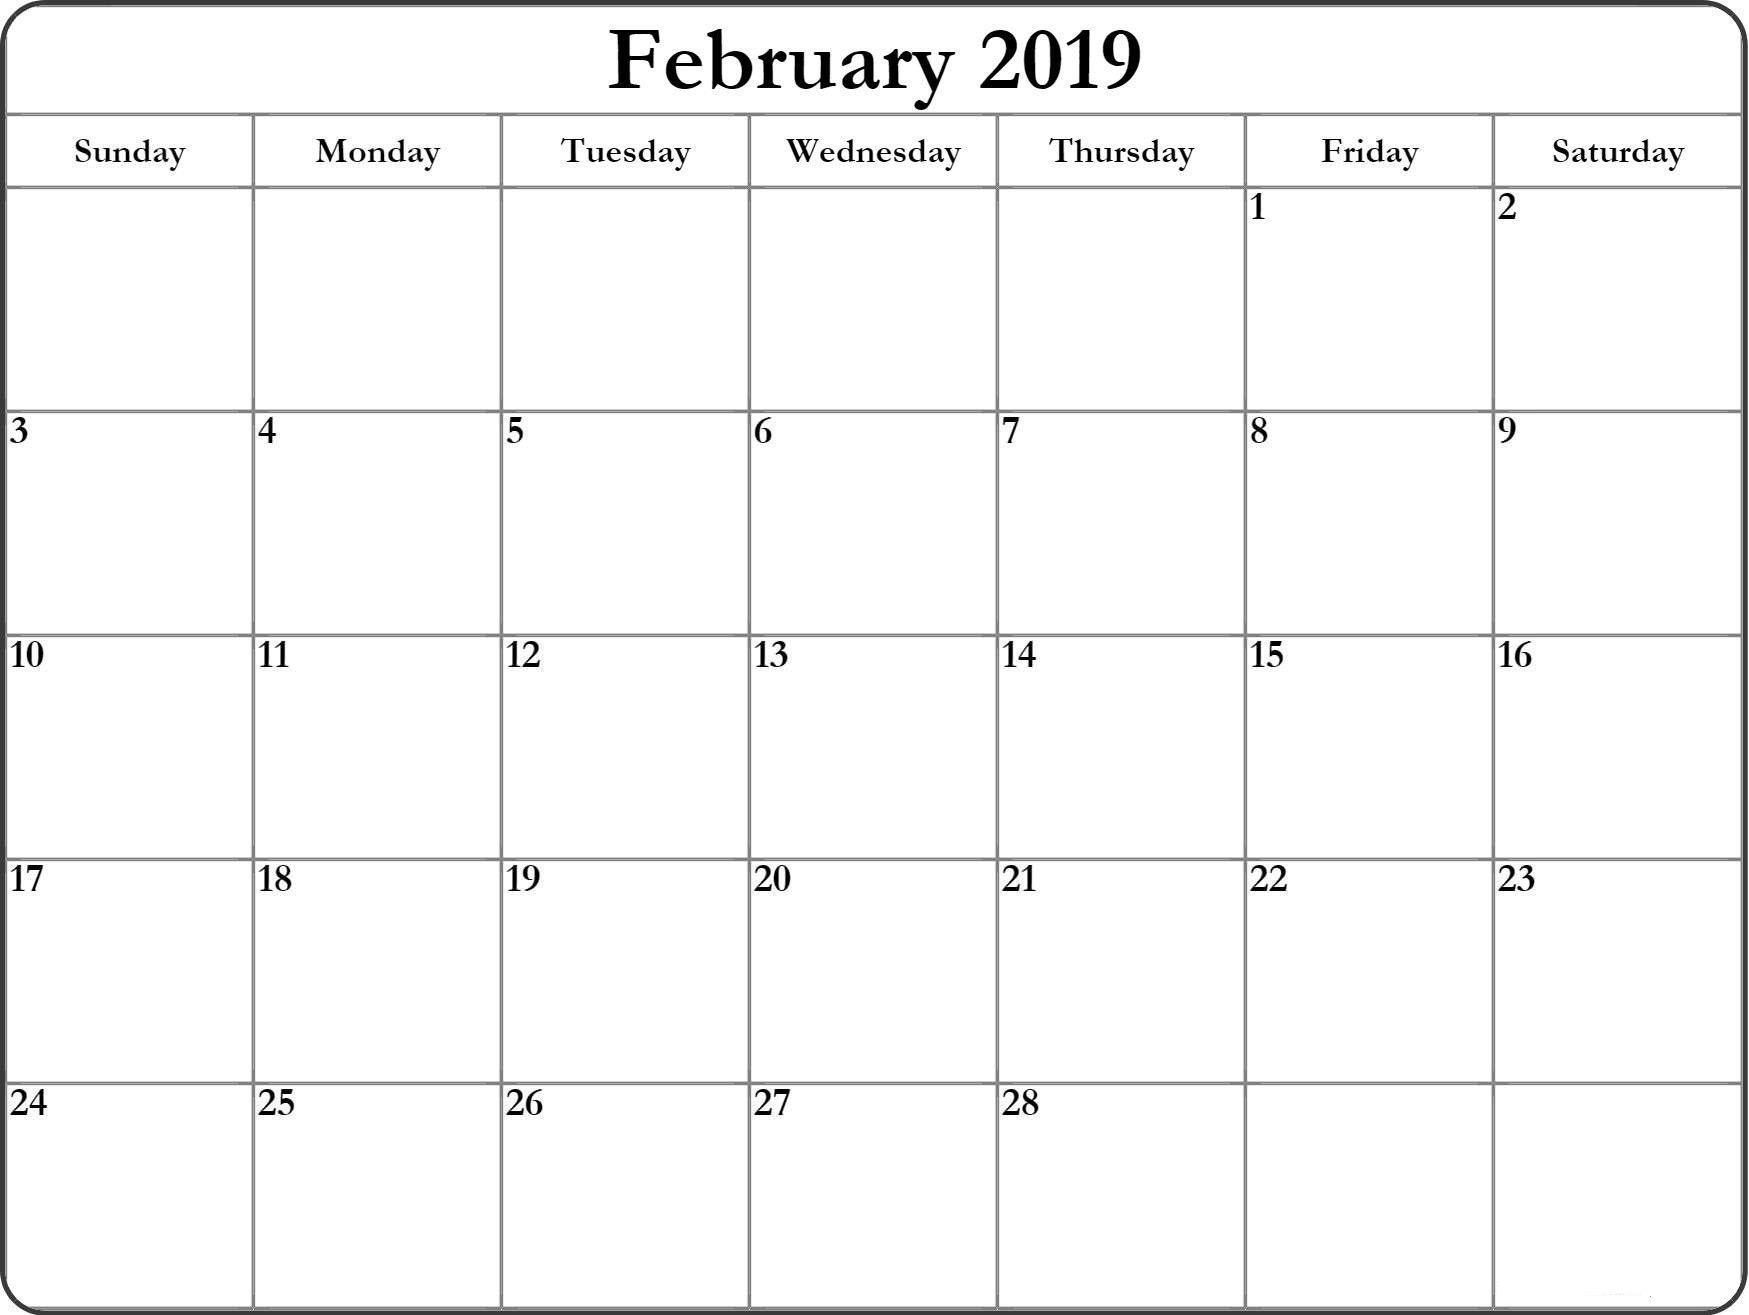 Print-A-Calendar February 2019 February 2019 Printable Calendar | February 2019 Calendar